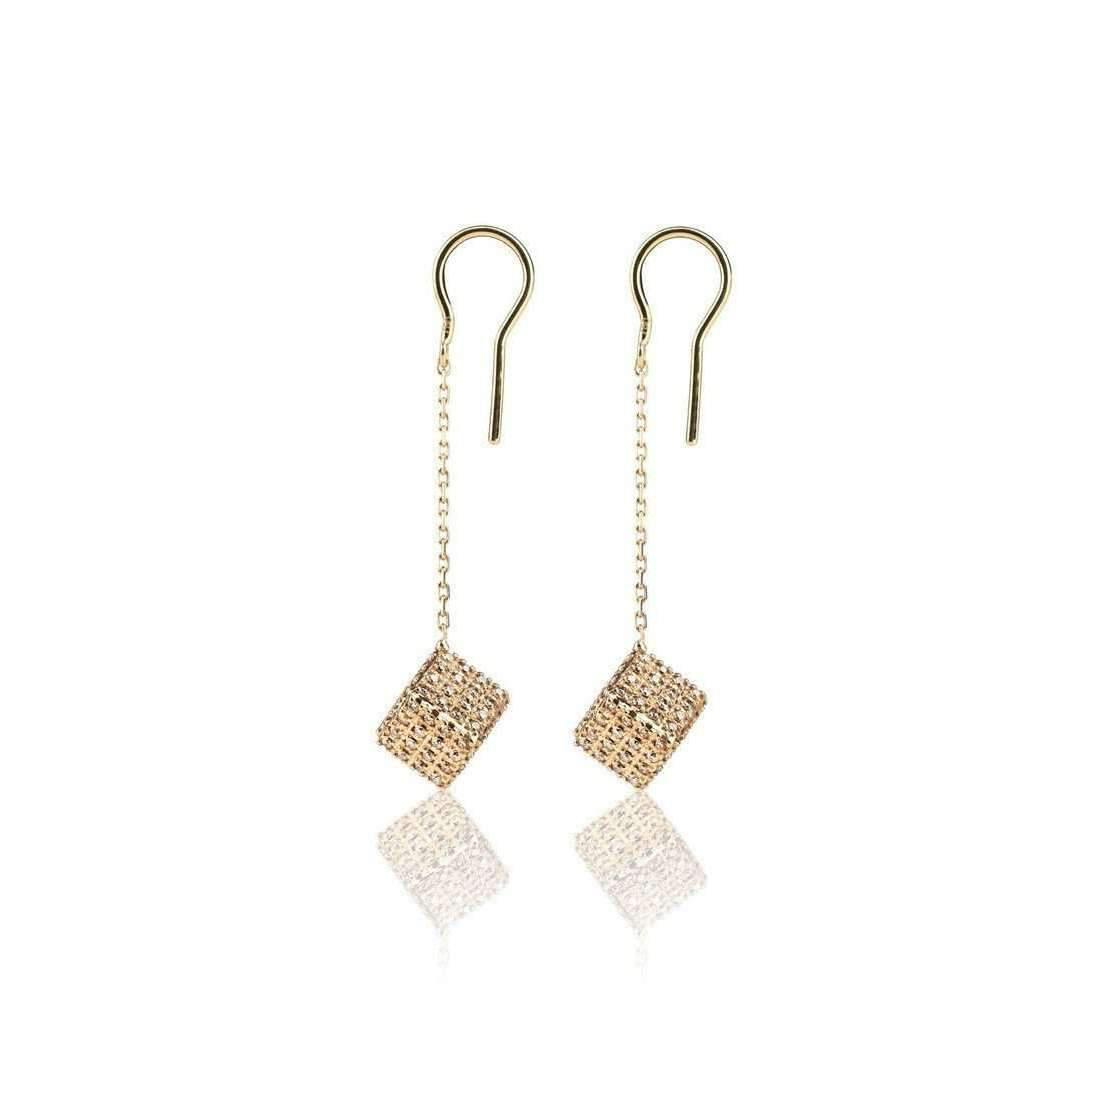 Agmes Womens Vera Earrings sX3kifr3